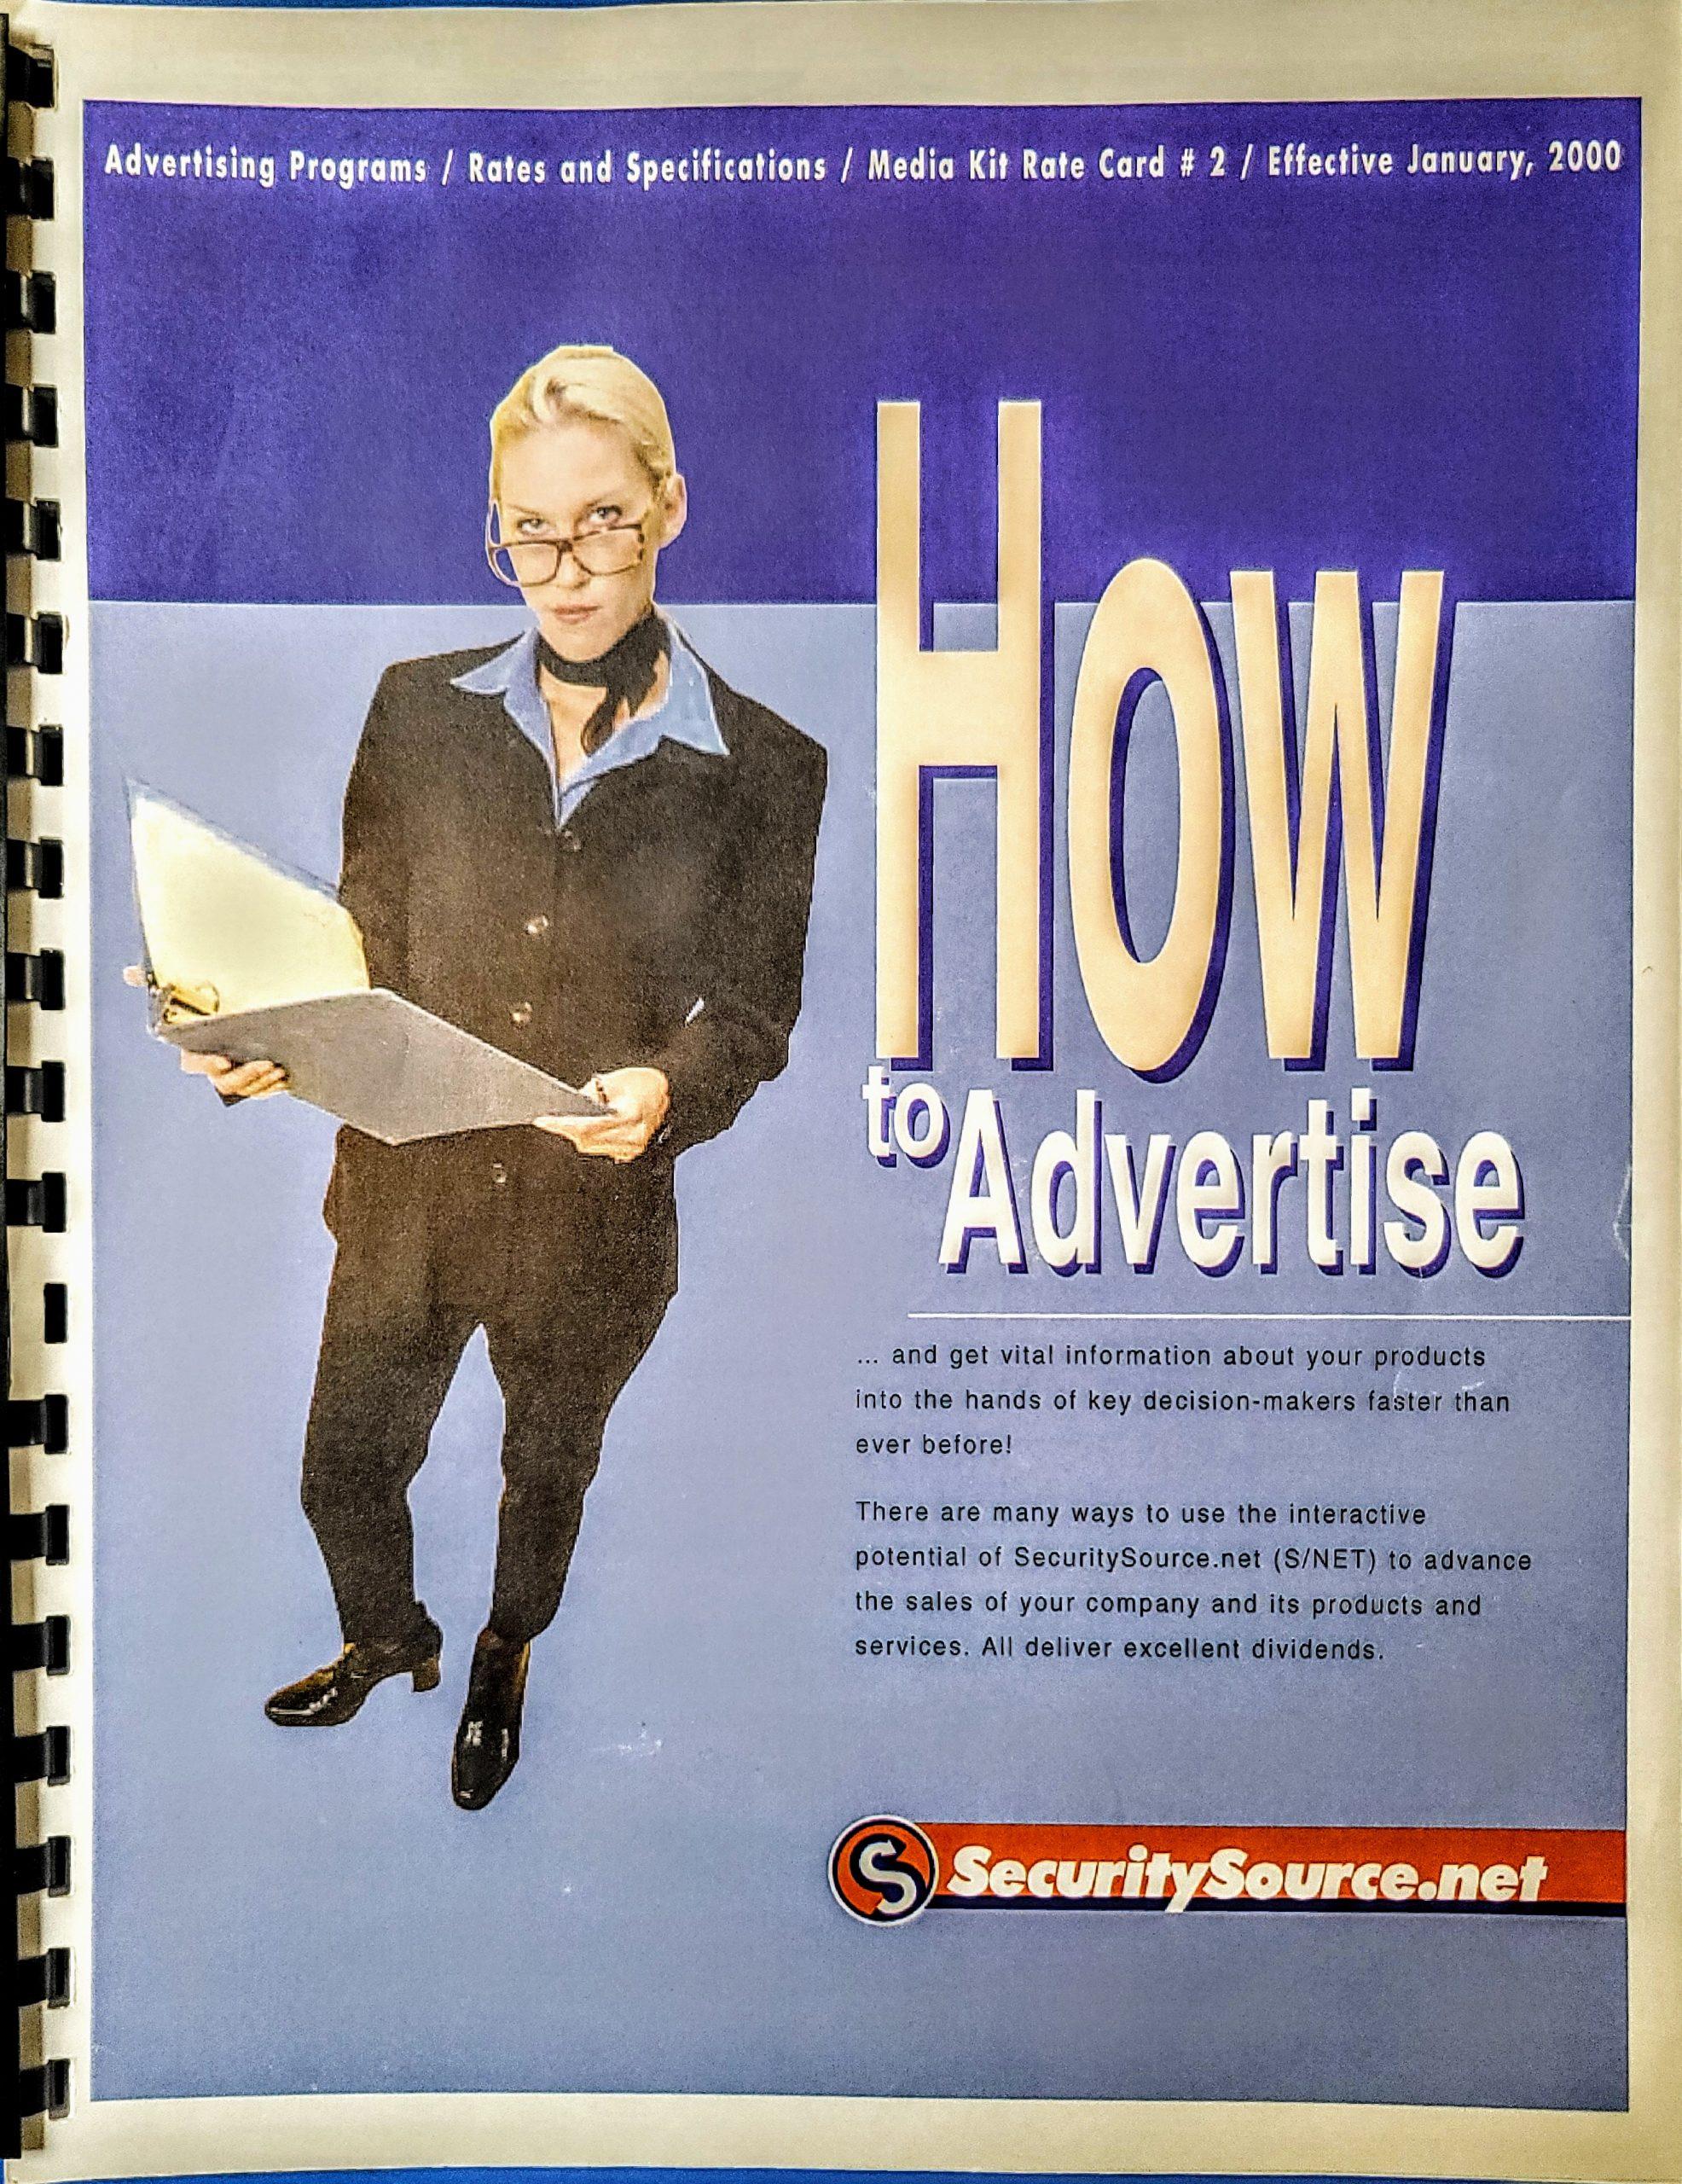 snet_securitysource_advertising sales_7